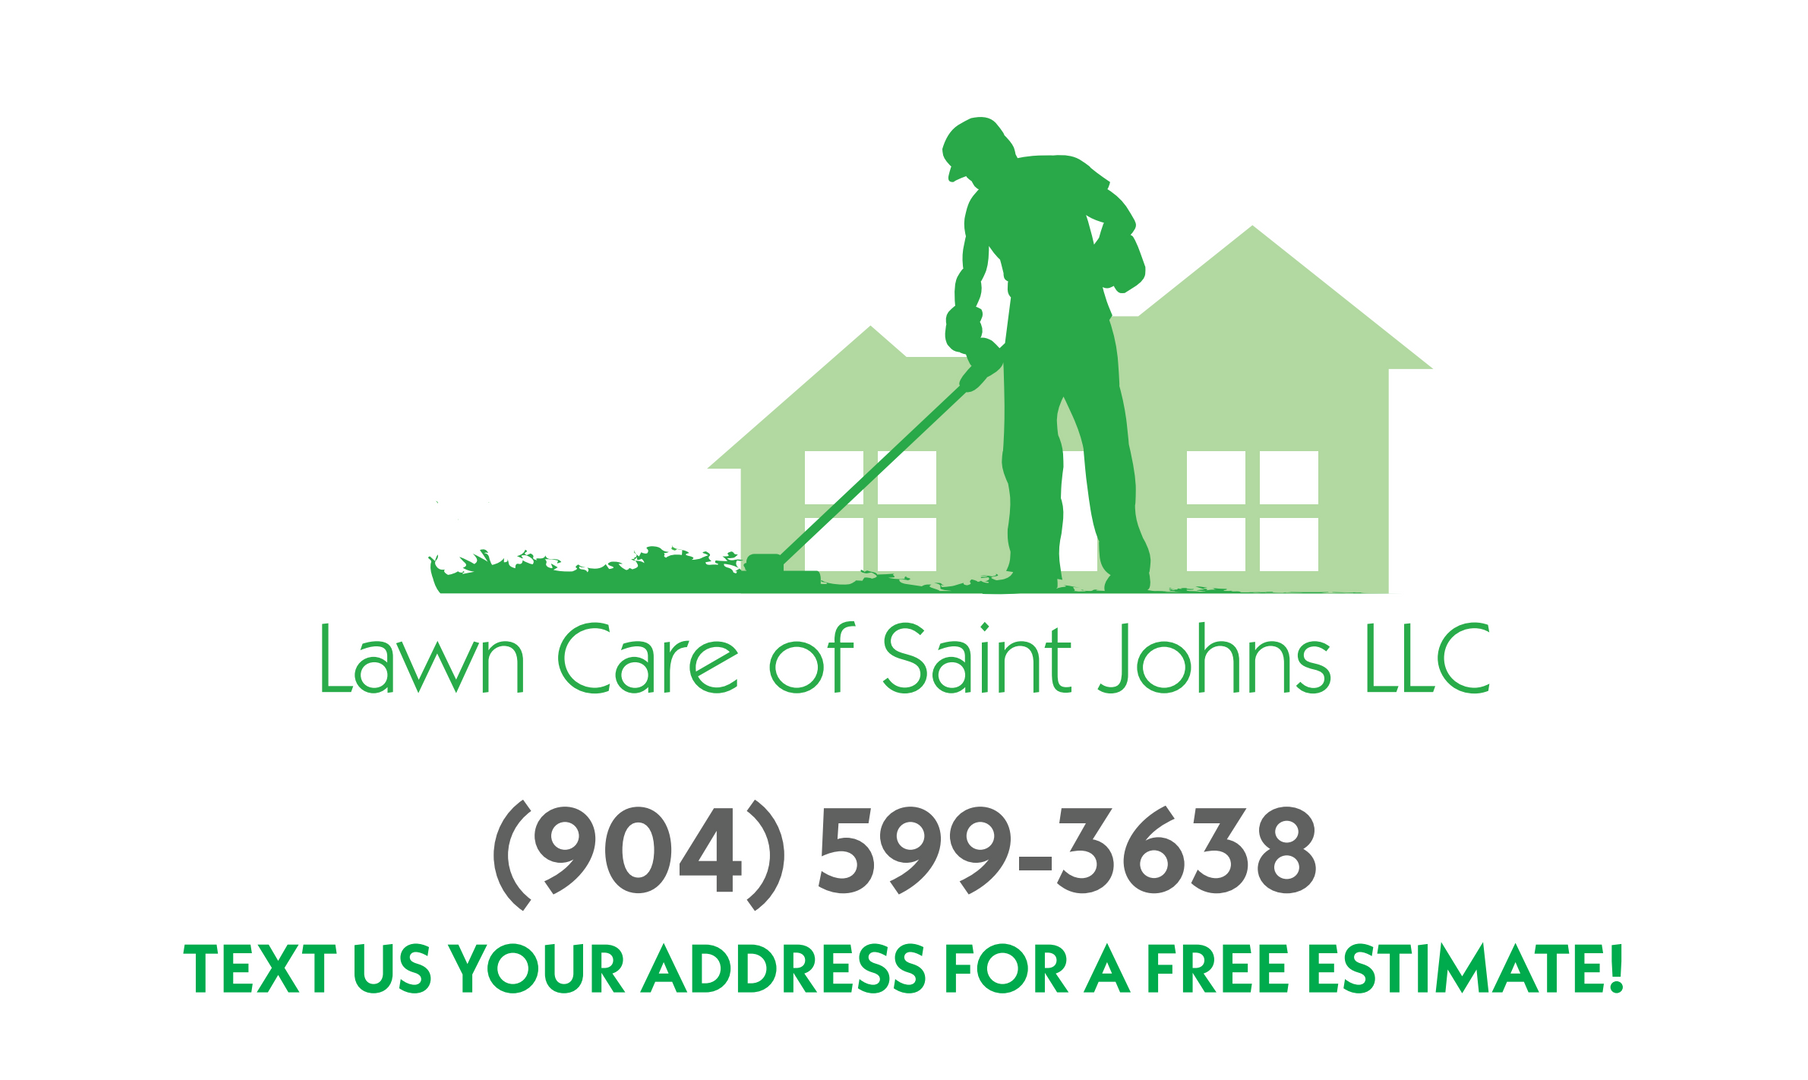 Lawn Care of Saint Johns LLC